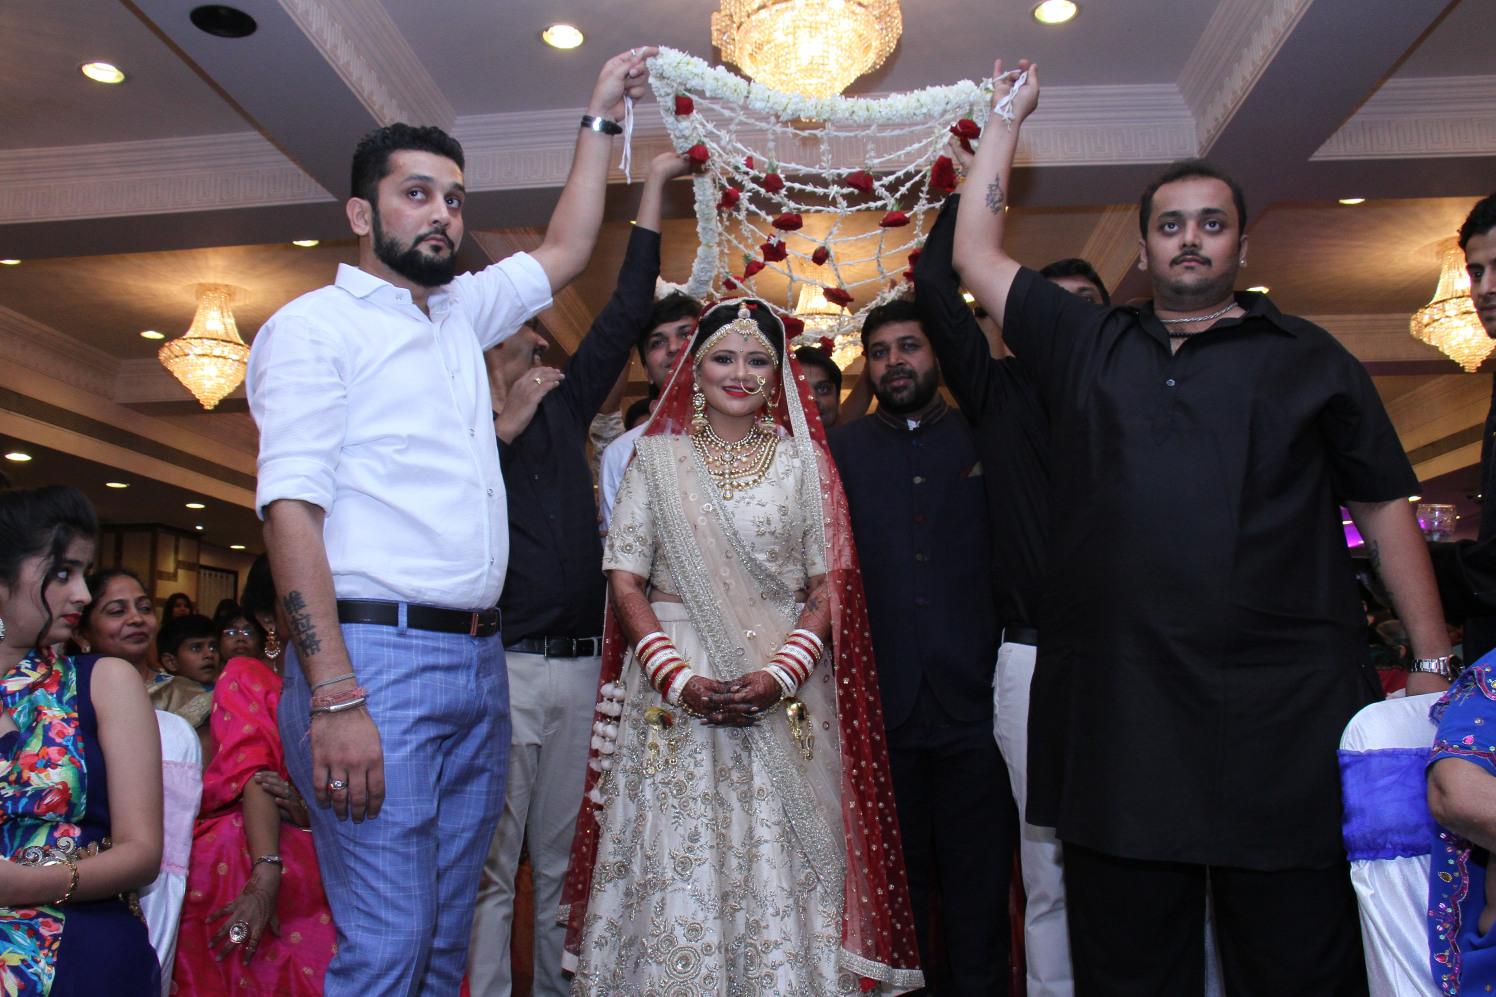 Magnificent bride by Shobha Dhillon Wedding-photography | Weddings Photos & Ideas